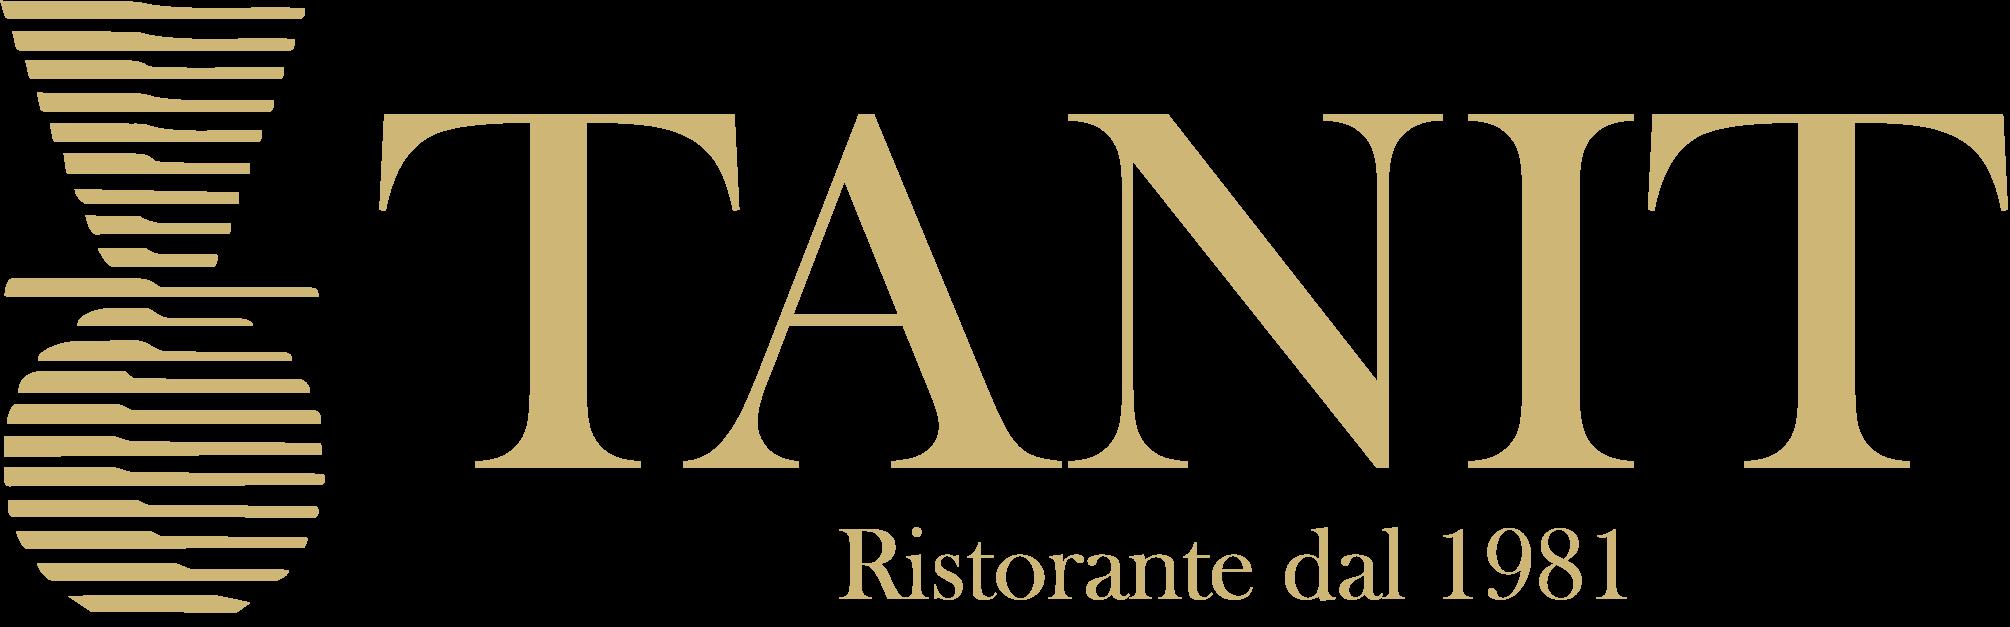 Tanit Hotel